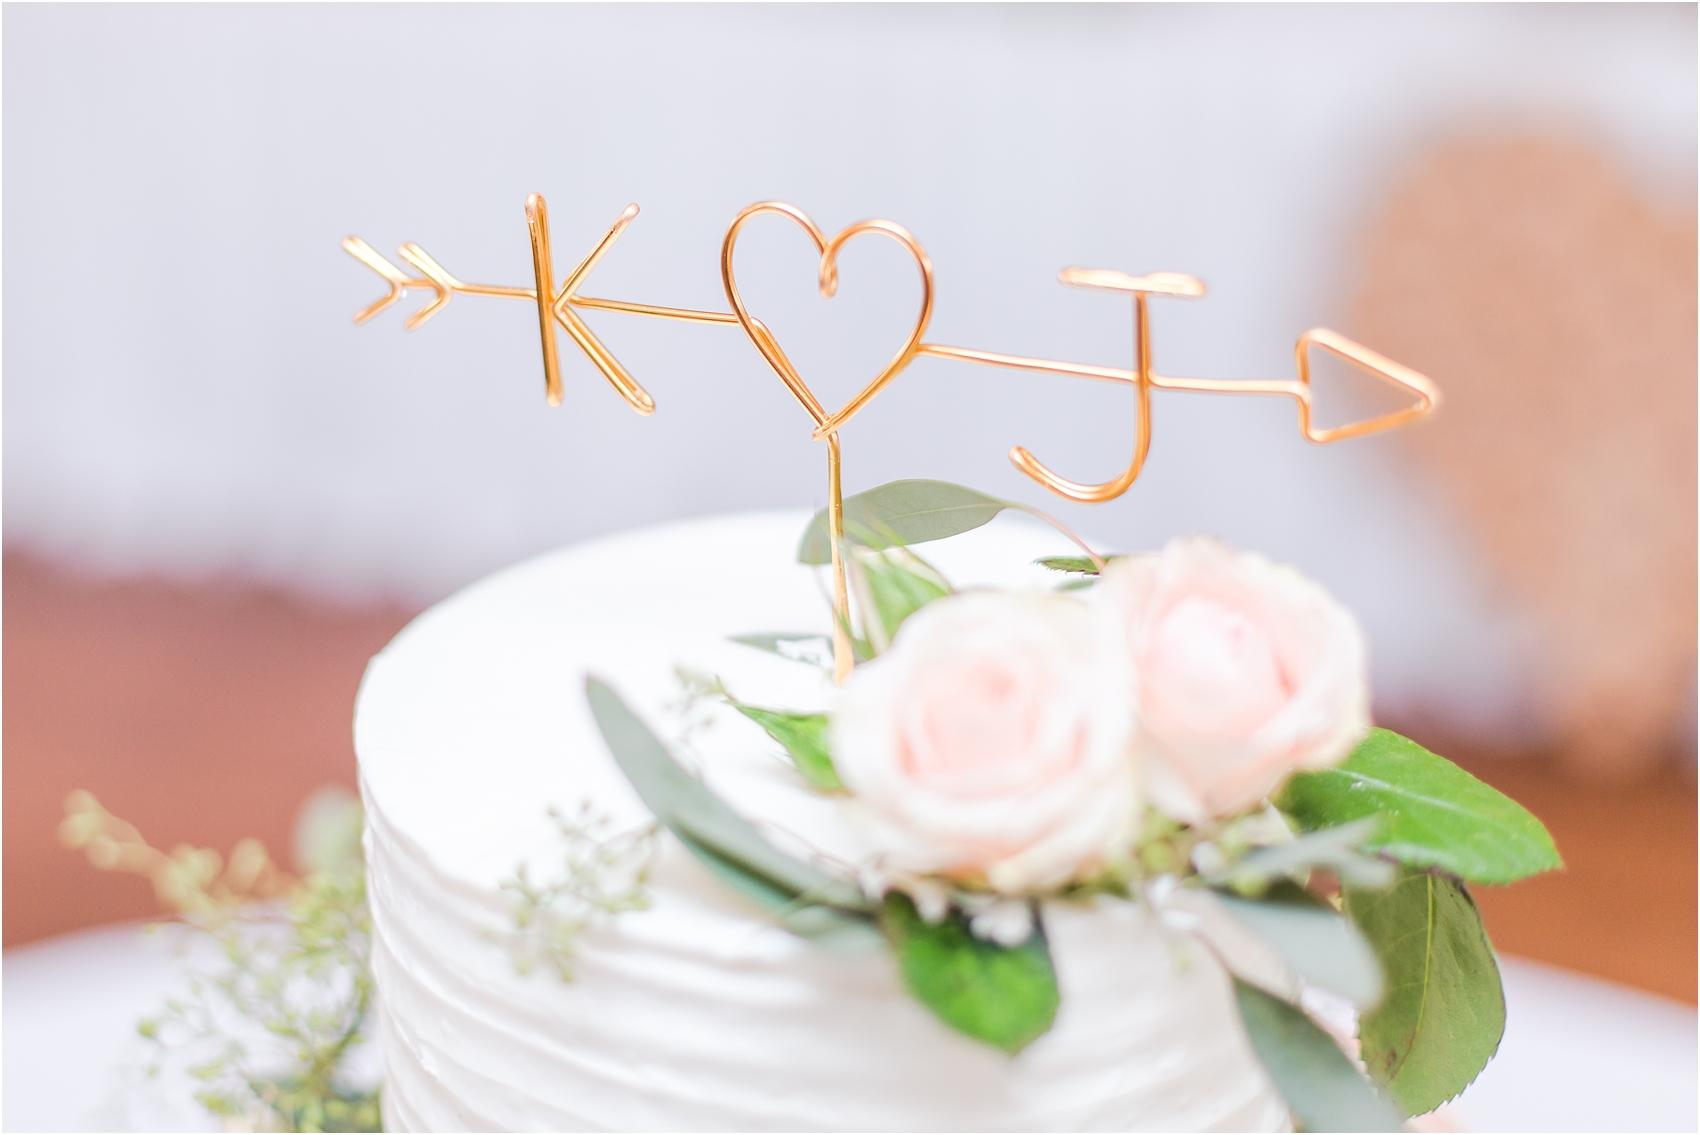 elegant-and-romantic-fall-wedding-photos-at-st-marys-catholic-church-in-monroe-michigan-by-courtney-carolyn-photography_0066.jpg